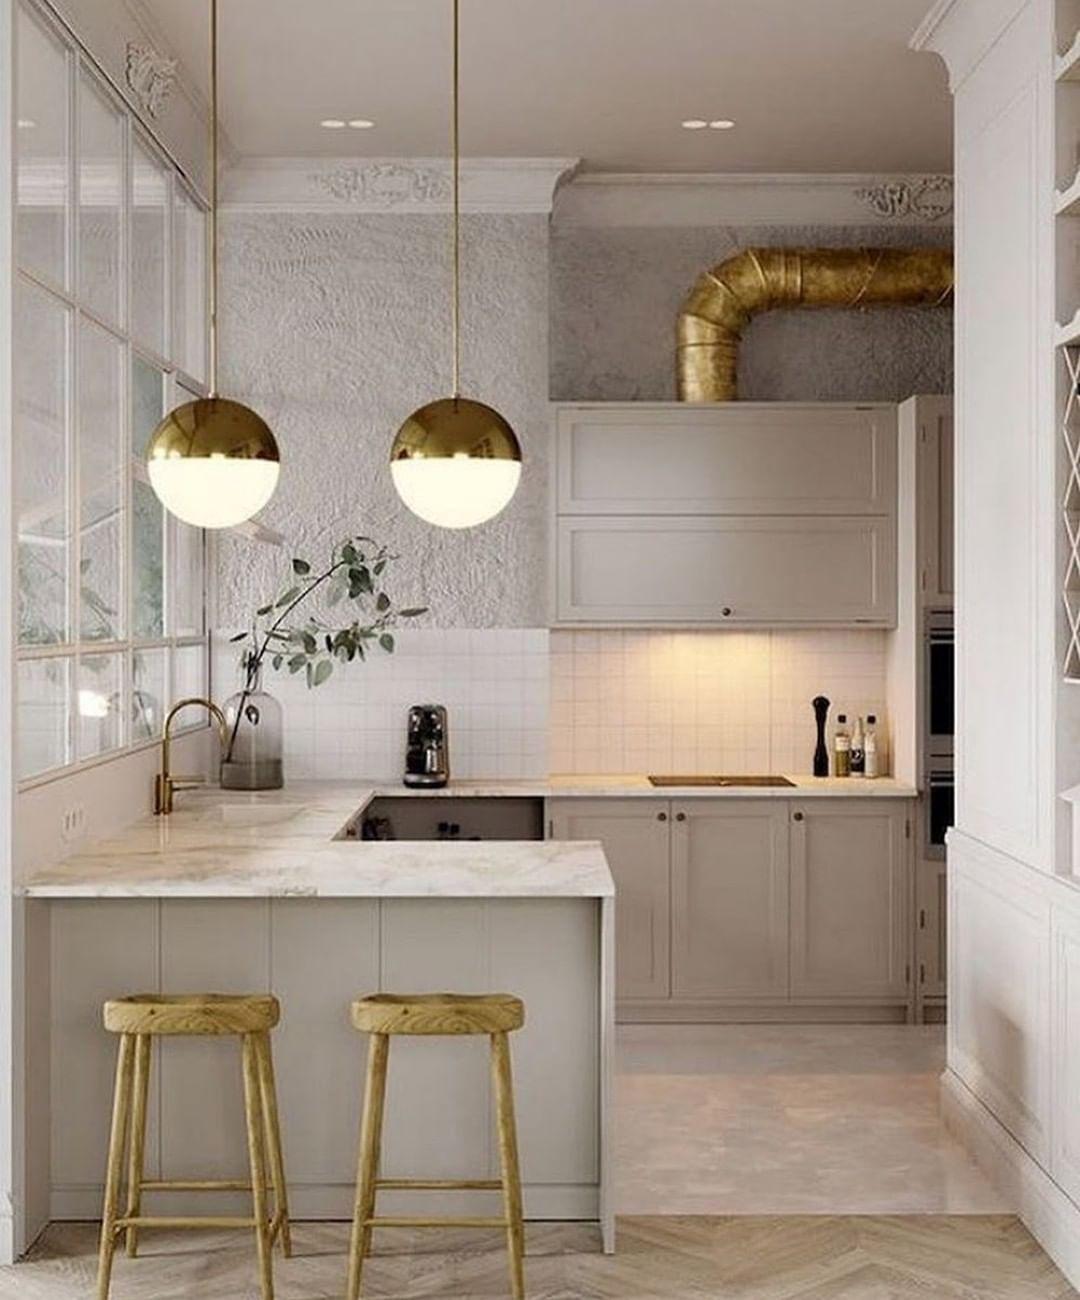 Sketchpadhouseplans Posted To Instagram Blending In Yet Standing Out London Interior I In 2020 Modern Kitchen Design Interior Design Kitchen Best Kitchen Designs